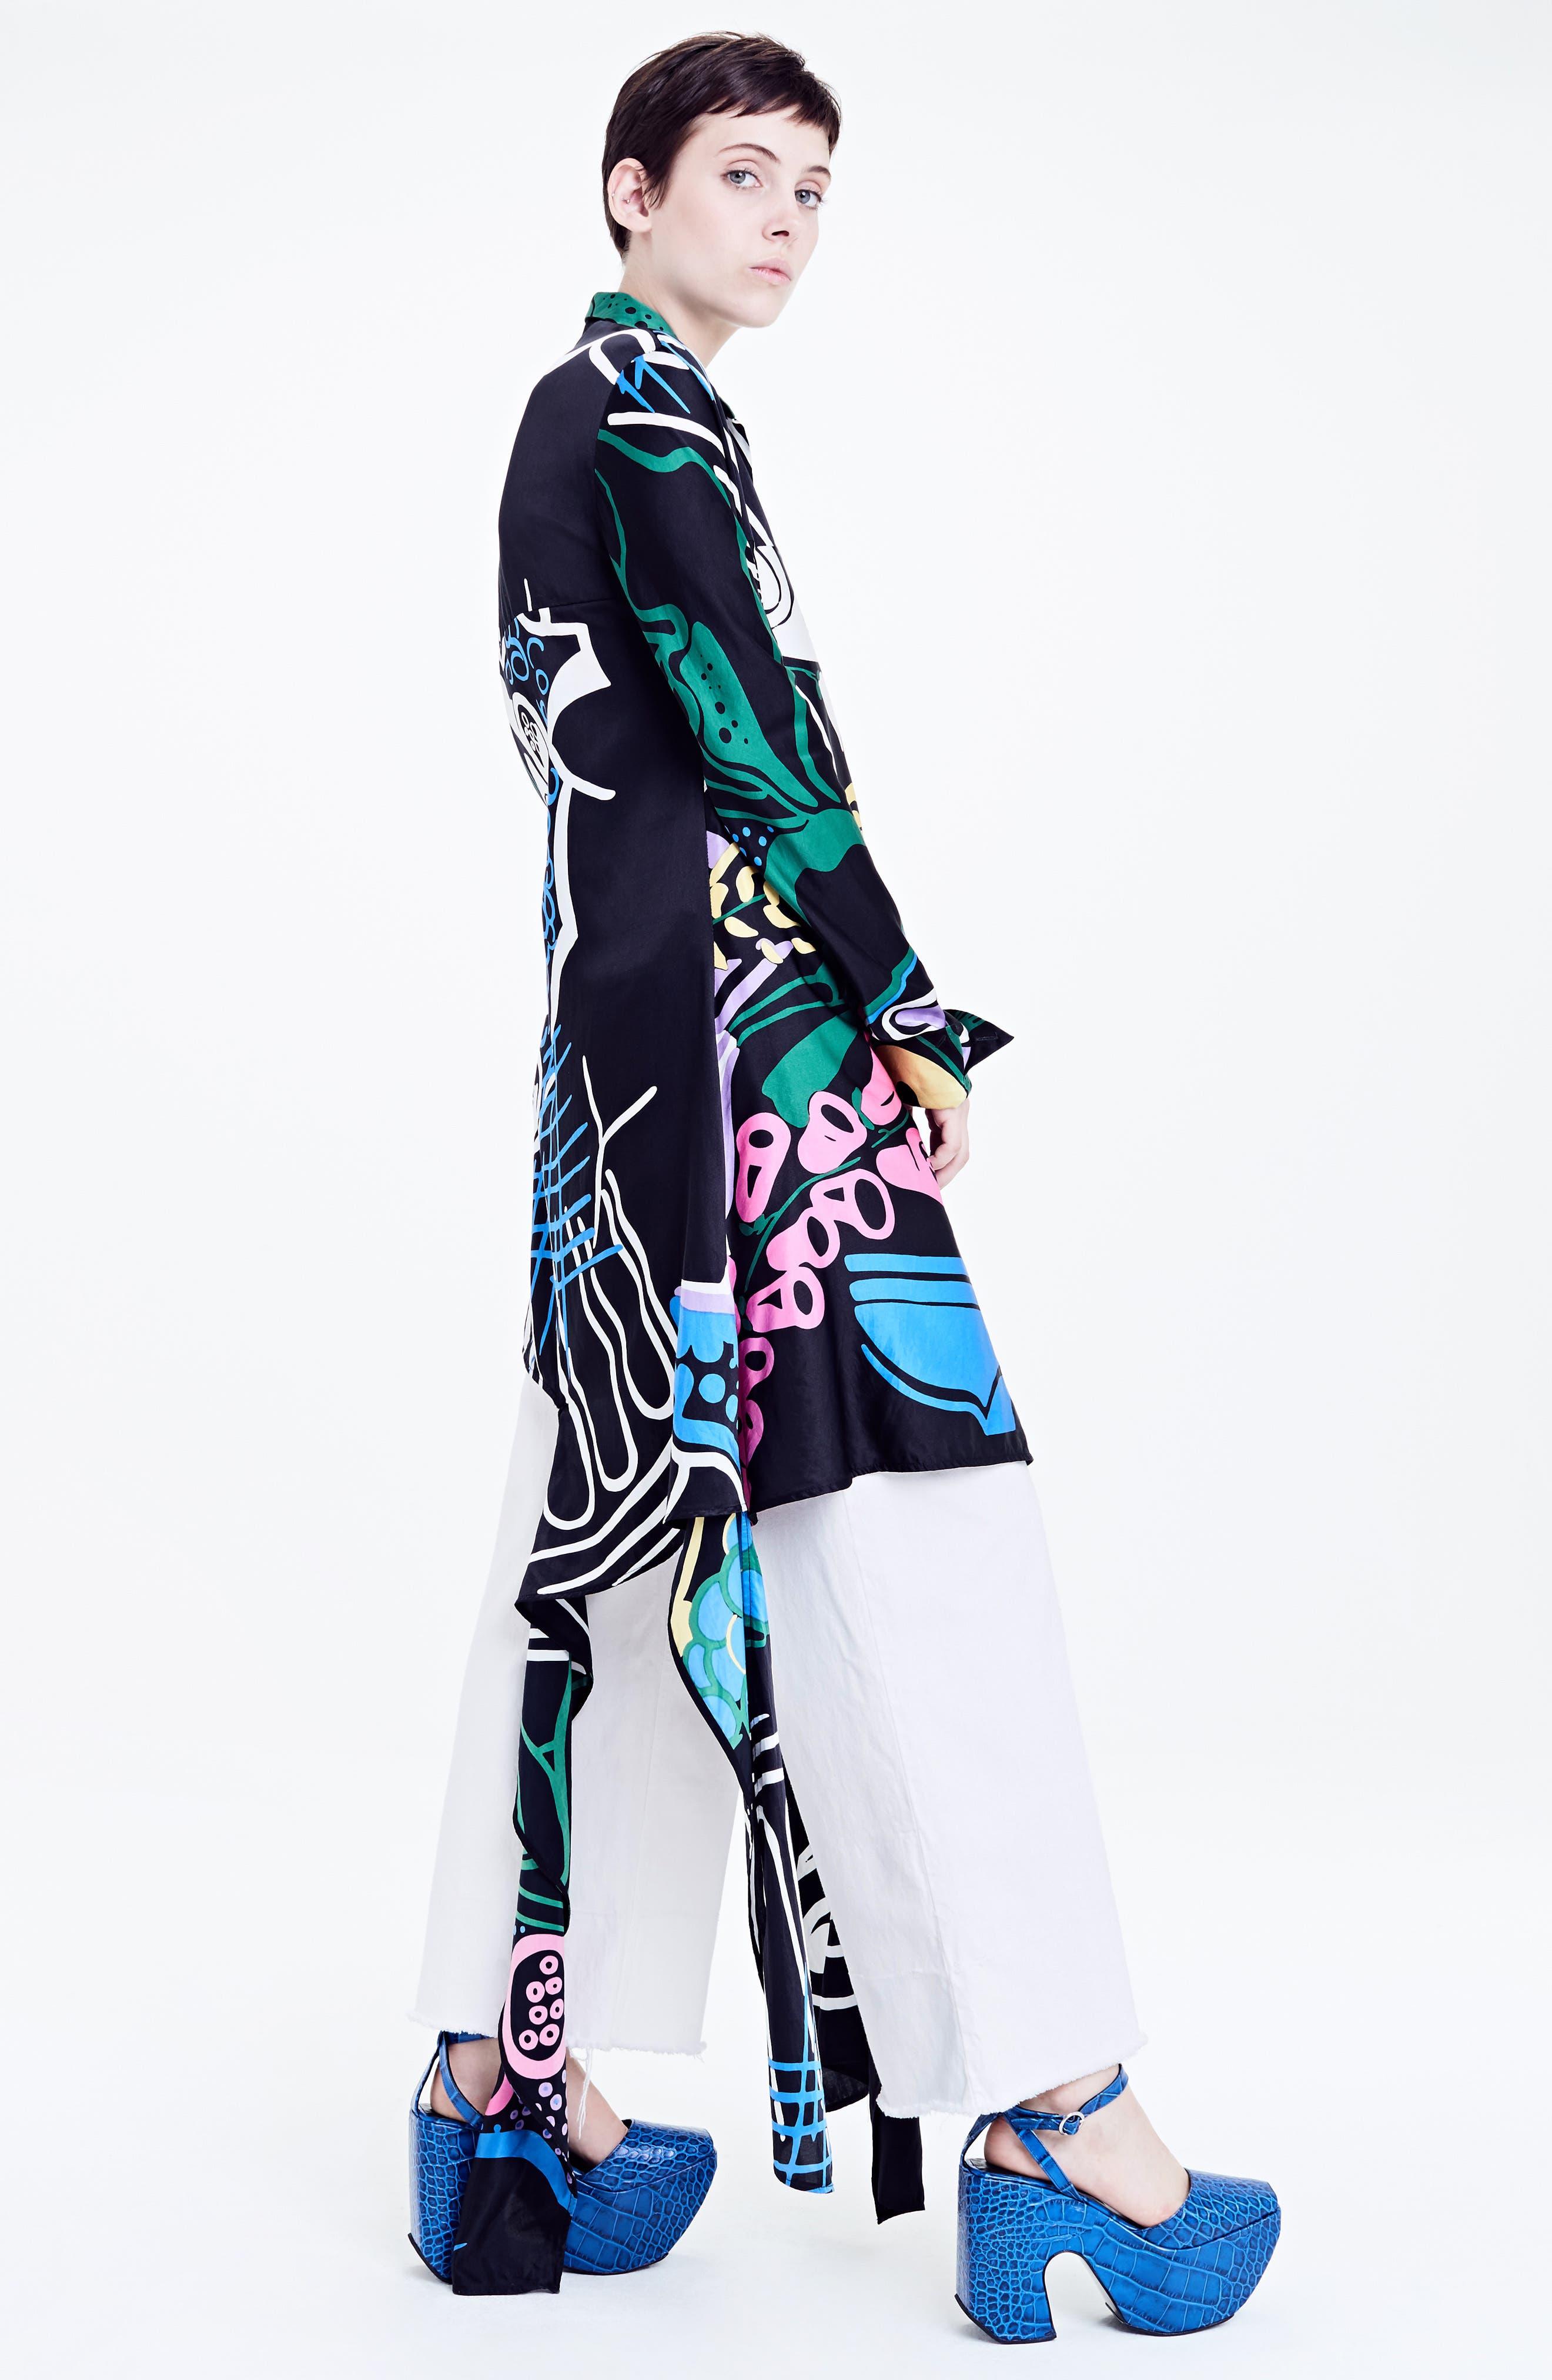 Foxglove Print Dress with Ribbon Detail,                             Alternate thumbnail 7, color,                             Black Foxglove Print